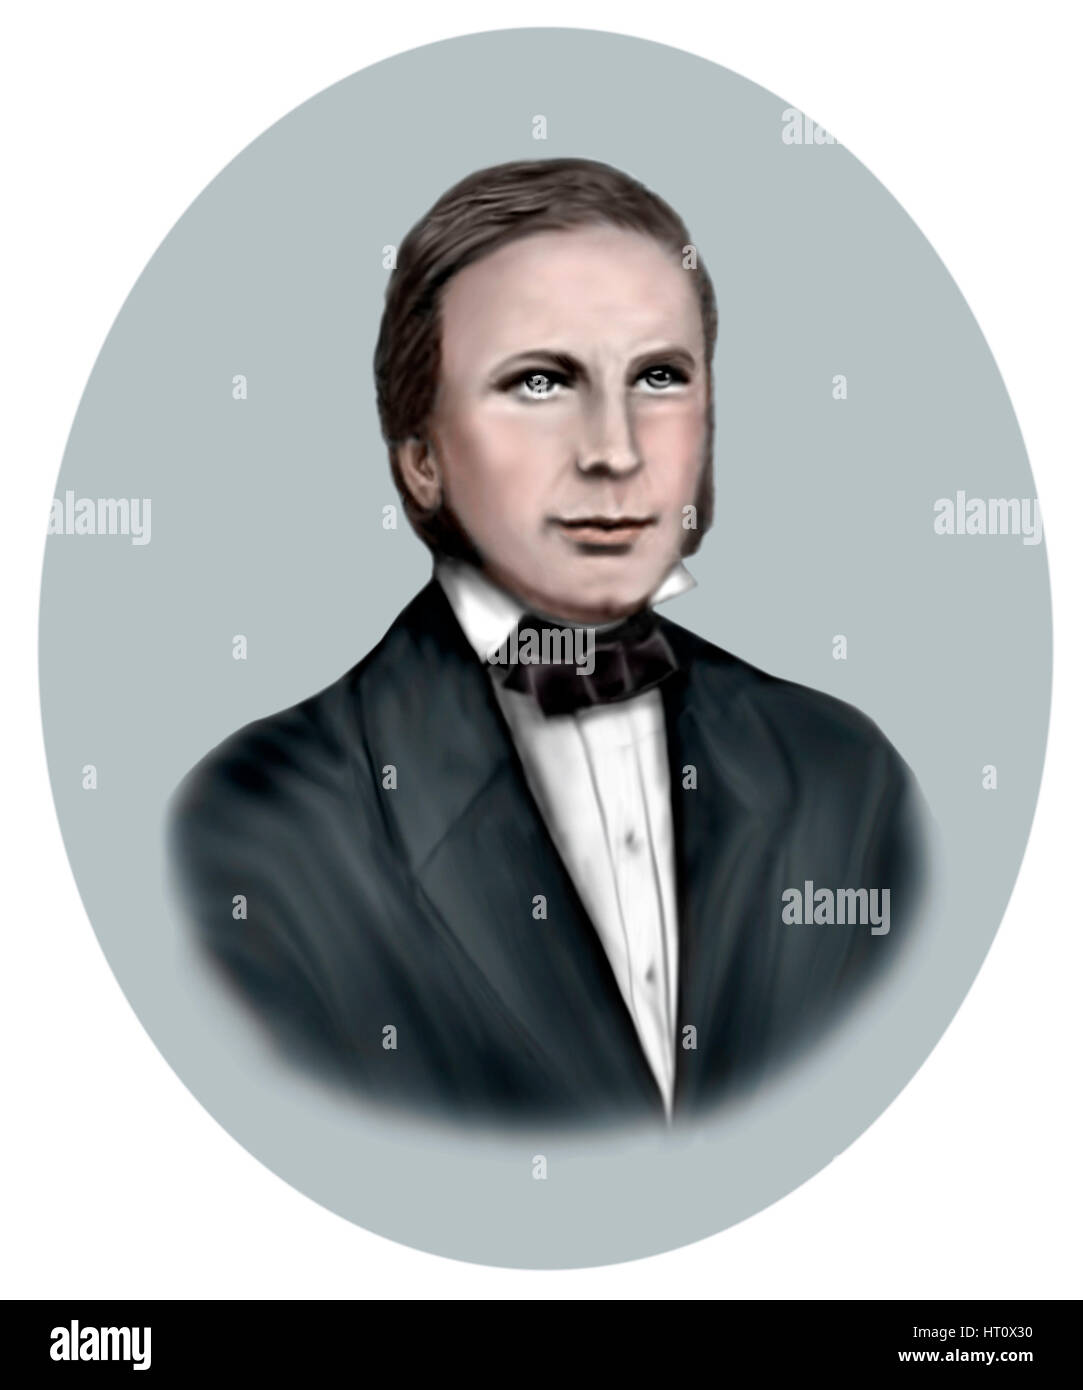 Augustus Welby Pugin, 1812-1852, English Architect, Designer, Artist, Critic - Stock Image